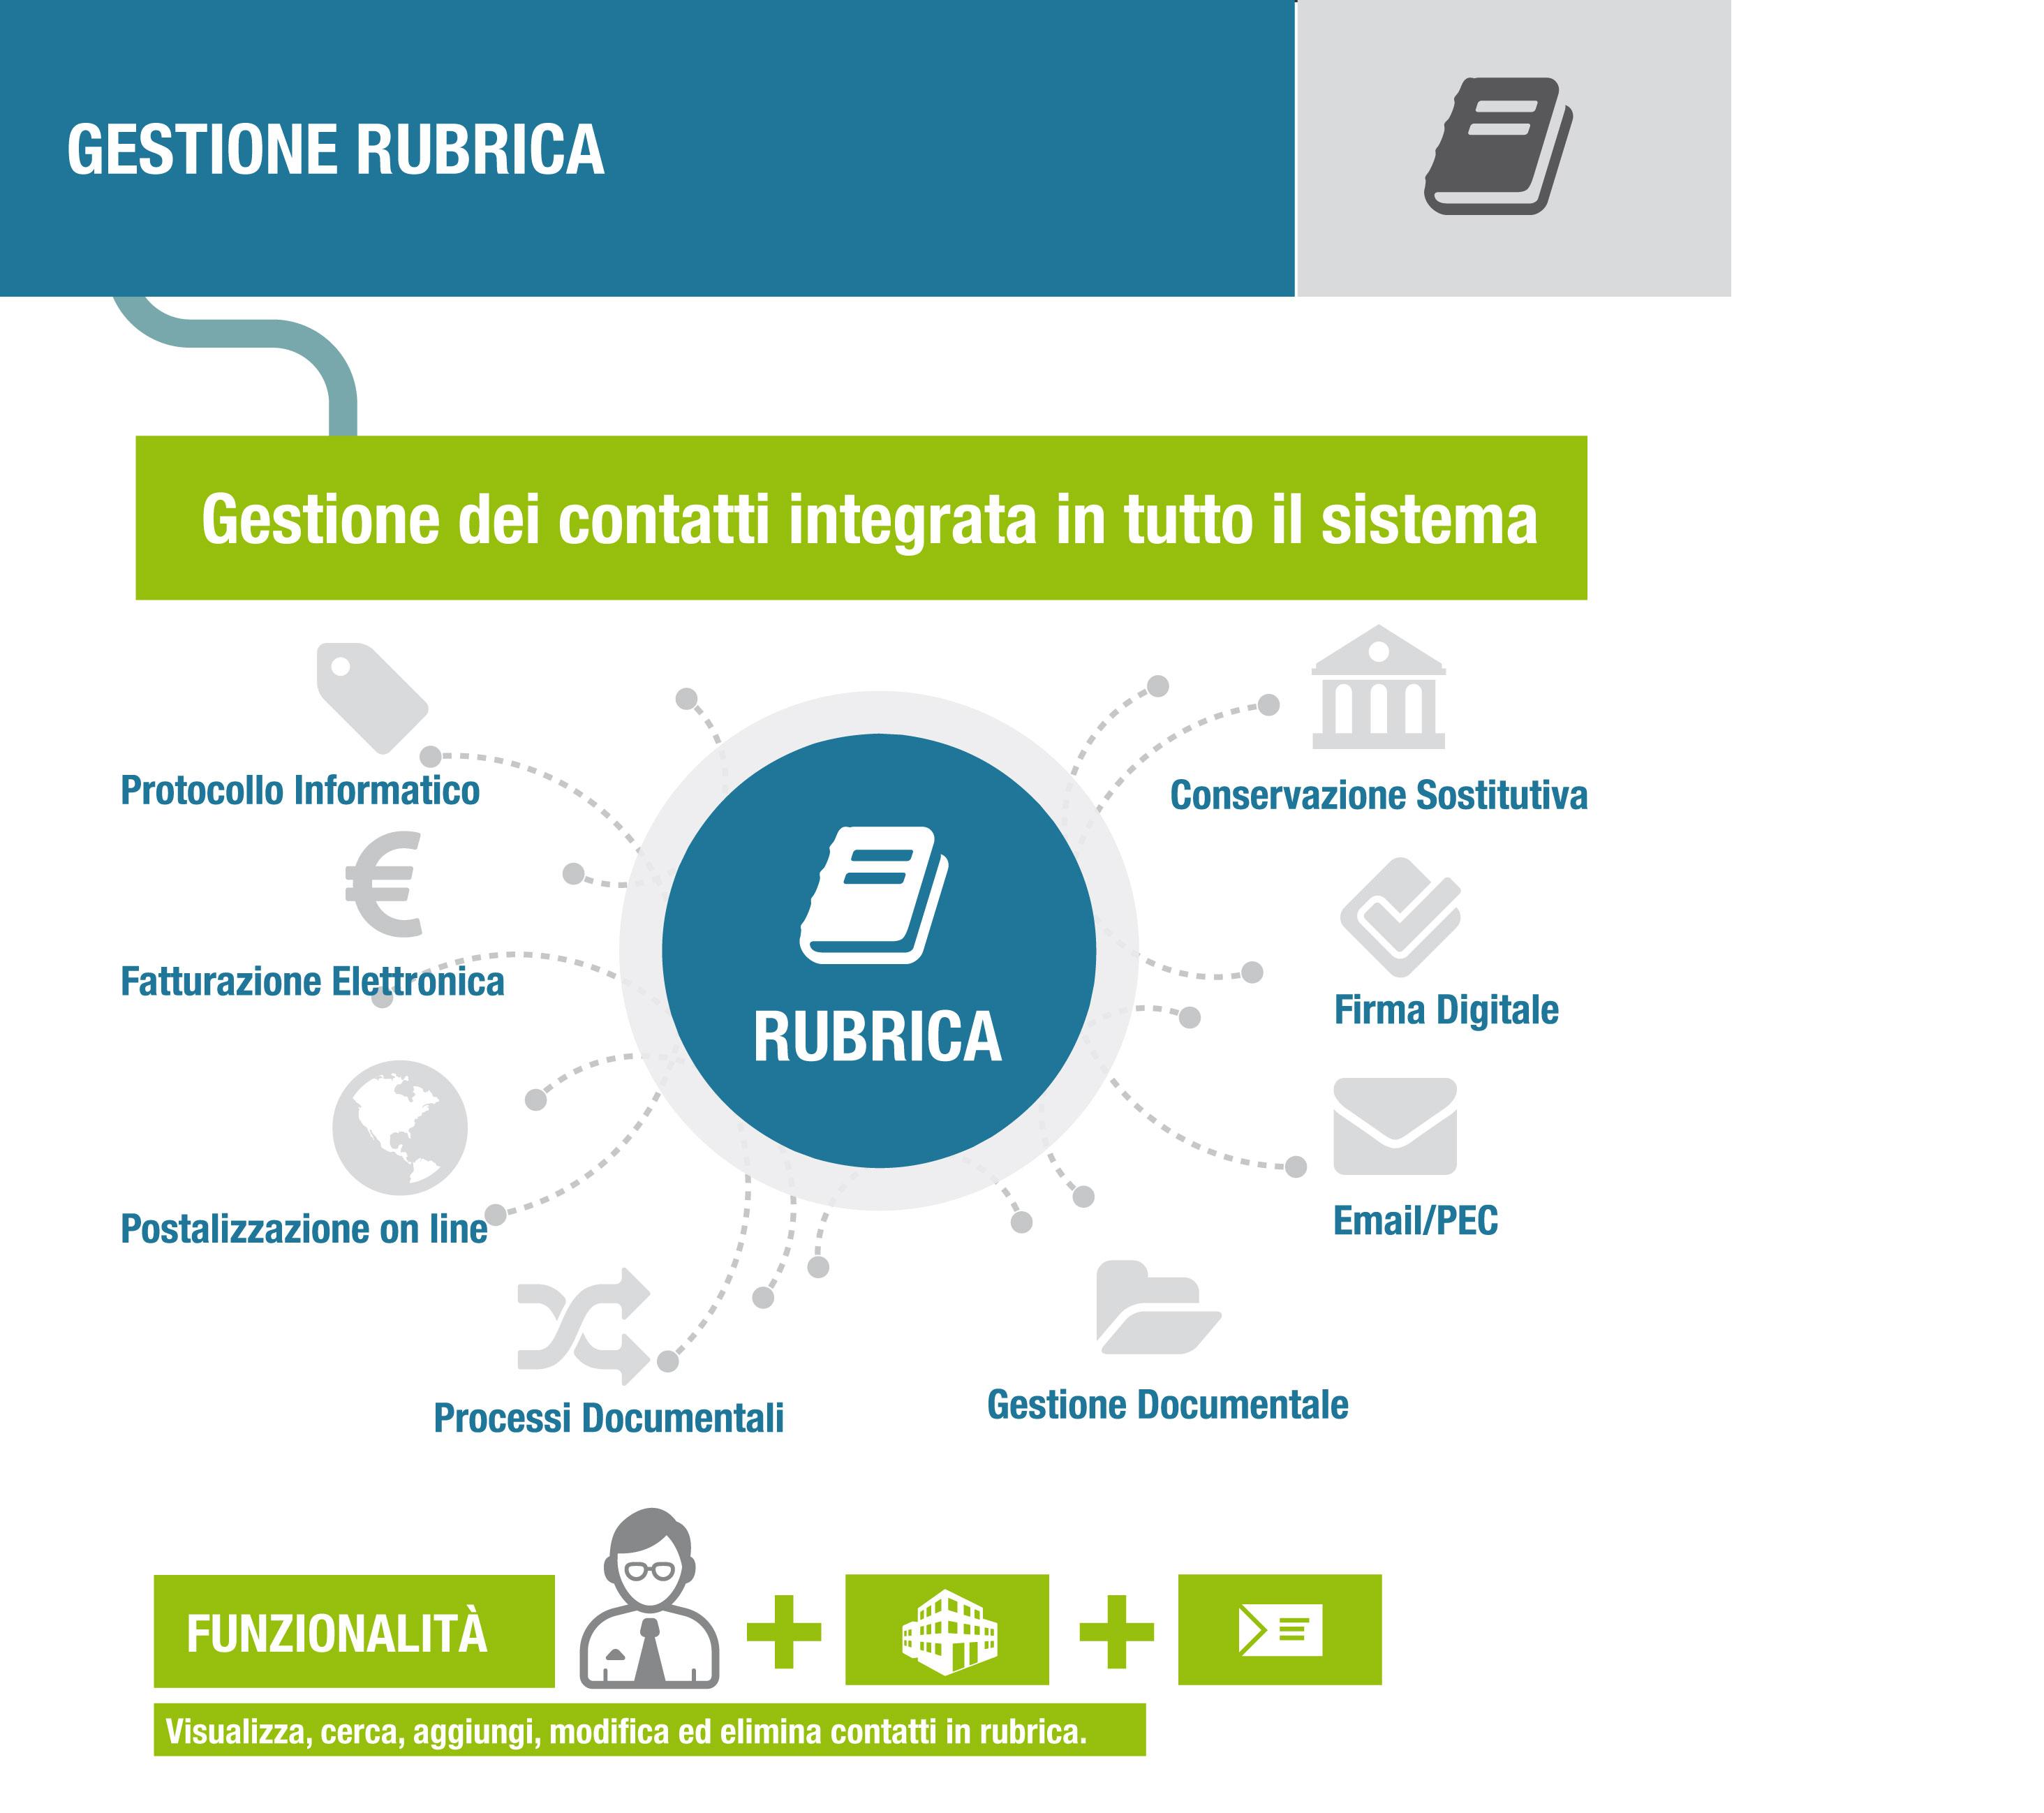 infografica-gestione-rubrica